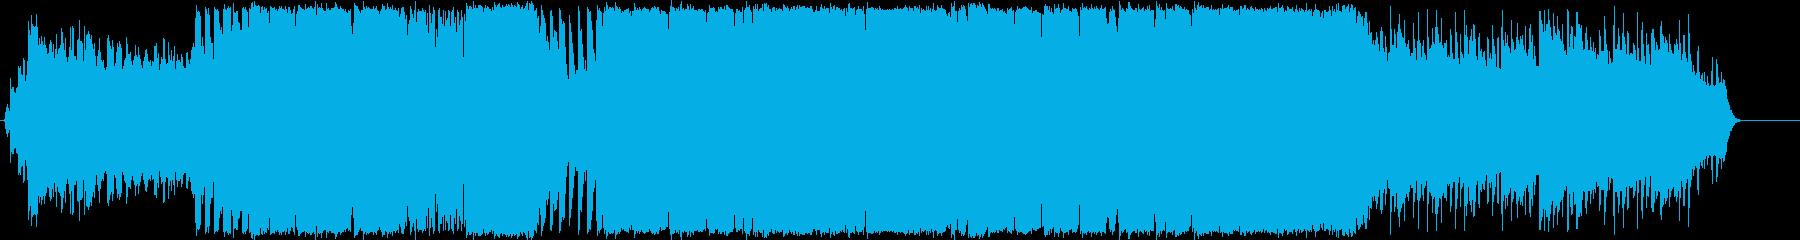 Happy Birthday, House ver.'s reproduced waveform